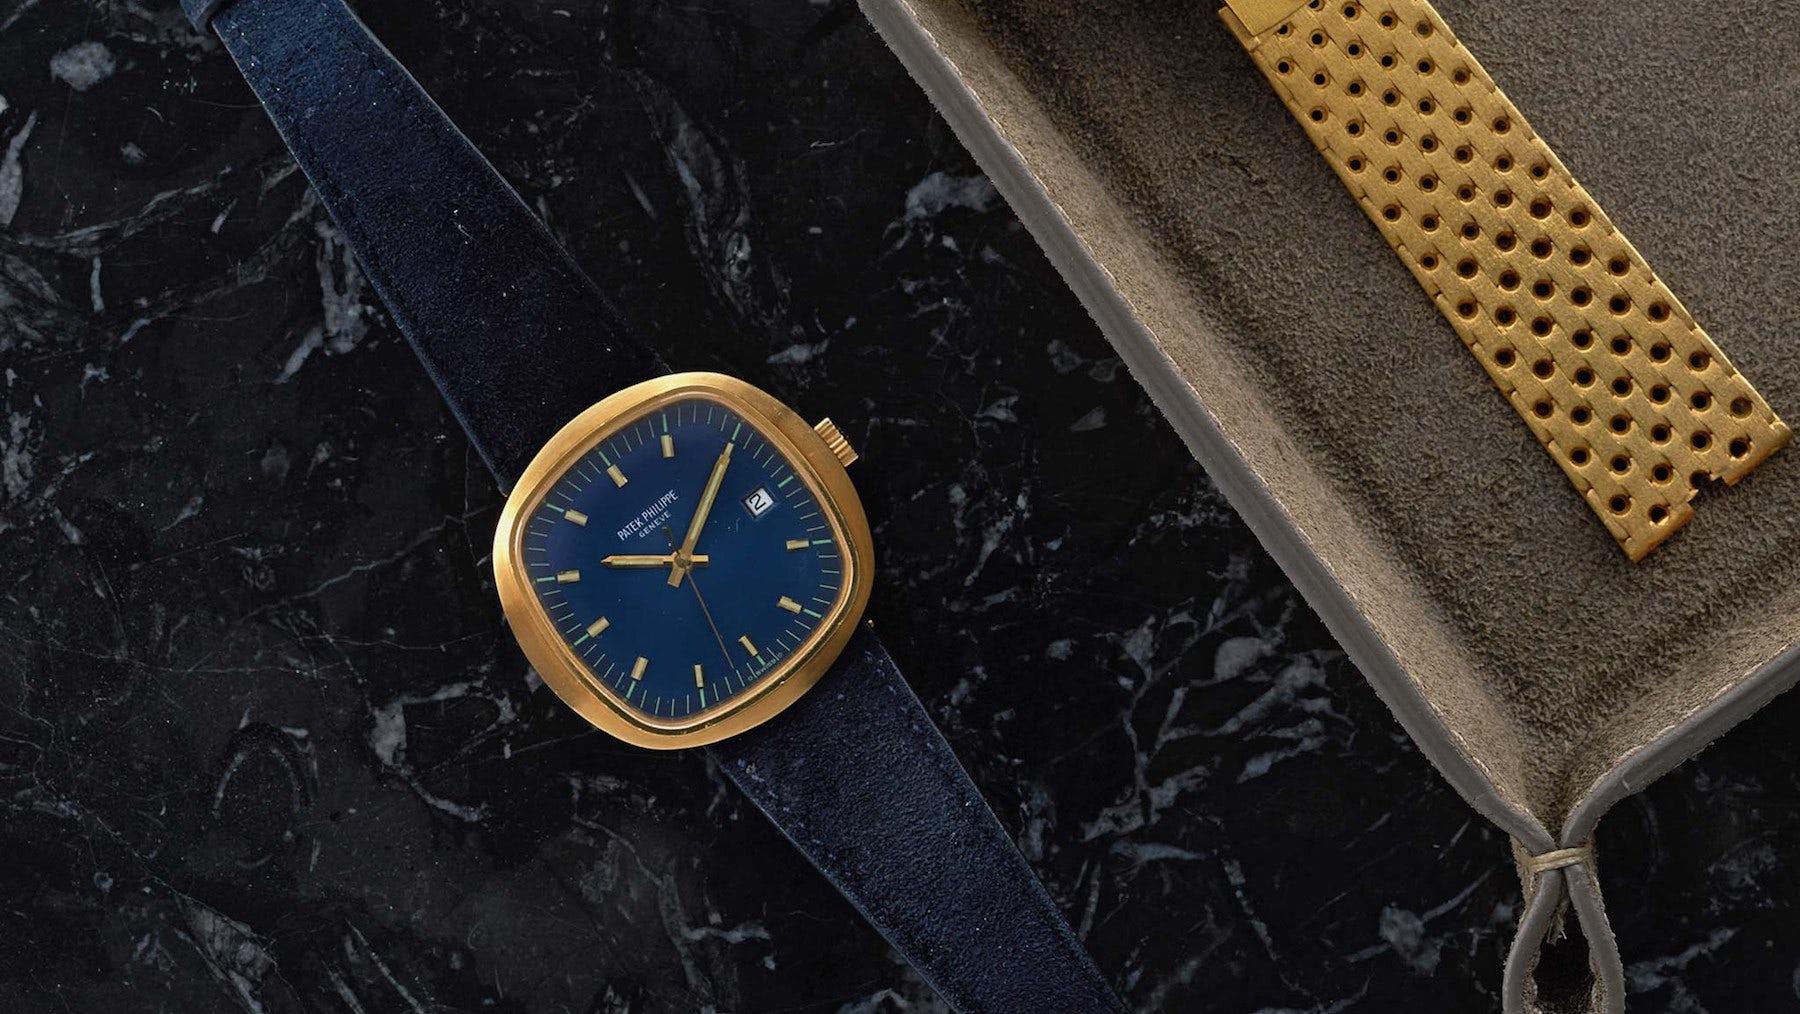 A vintage 1970s Patek Philippe watch | Source: Shop.Hodinkee.com